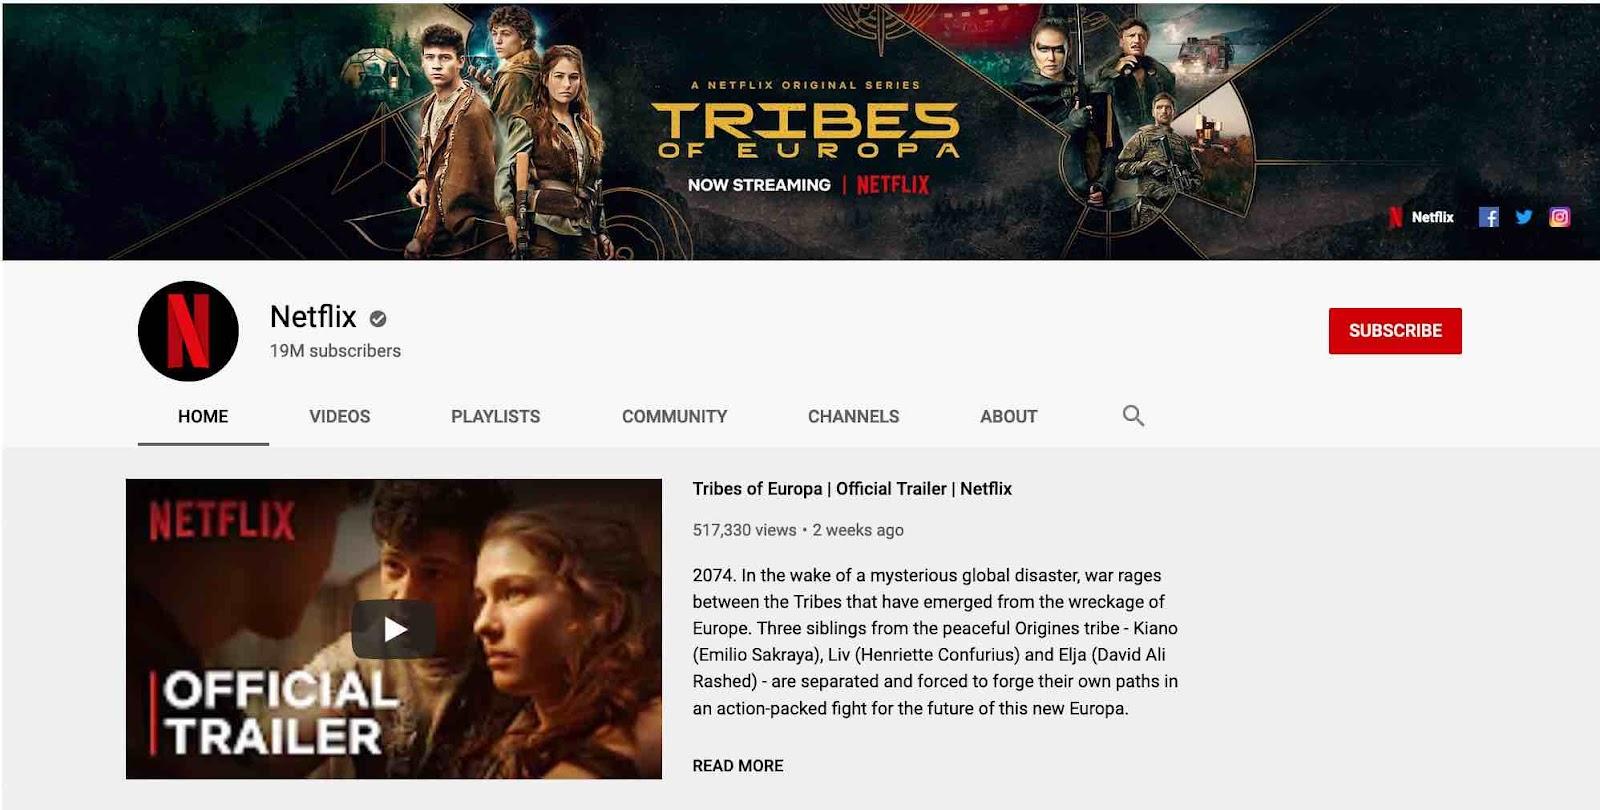 Netflix's YouTube channel layout